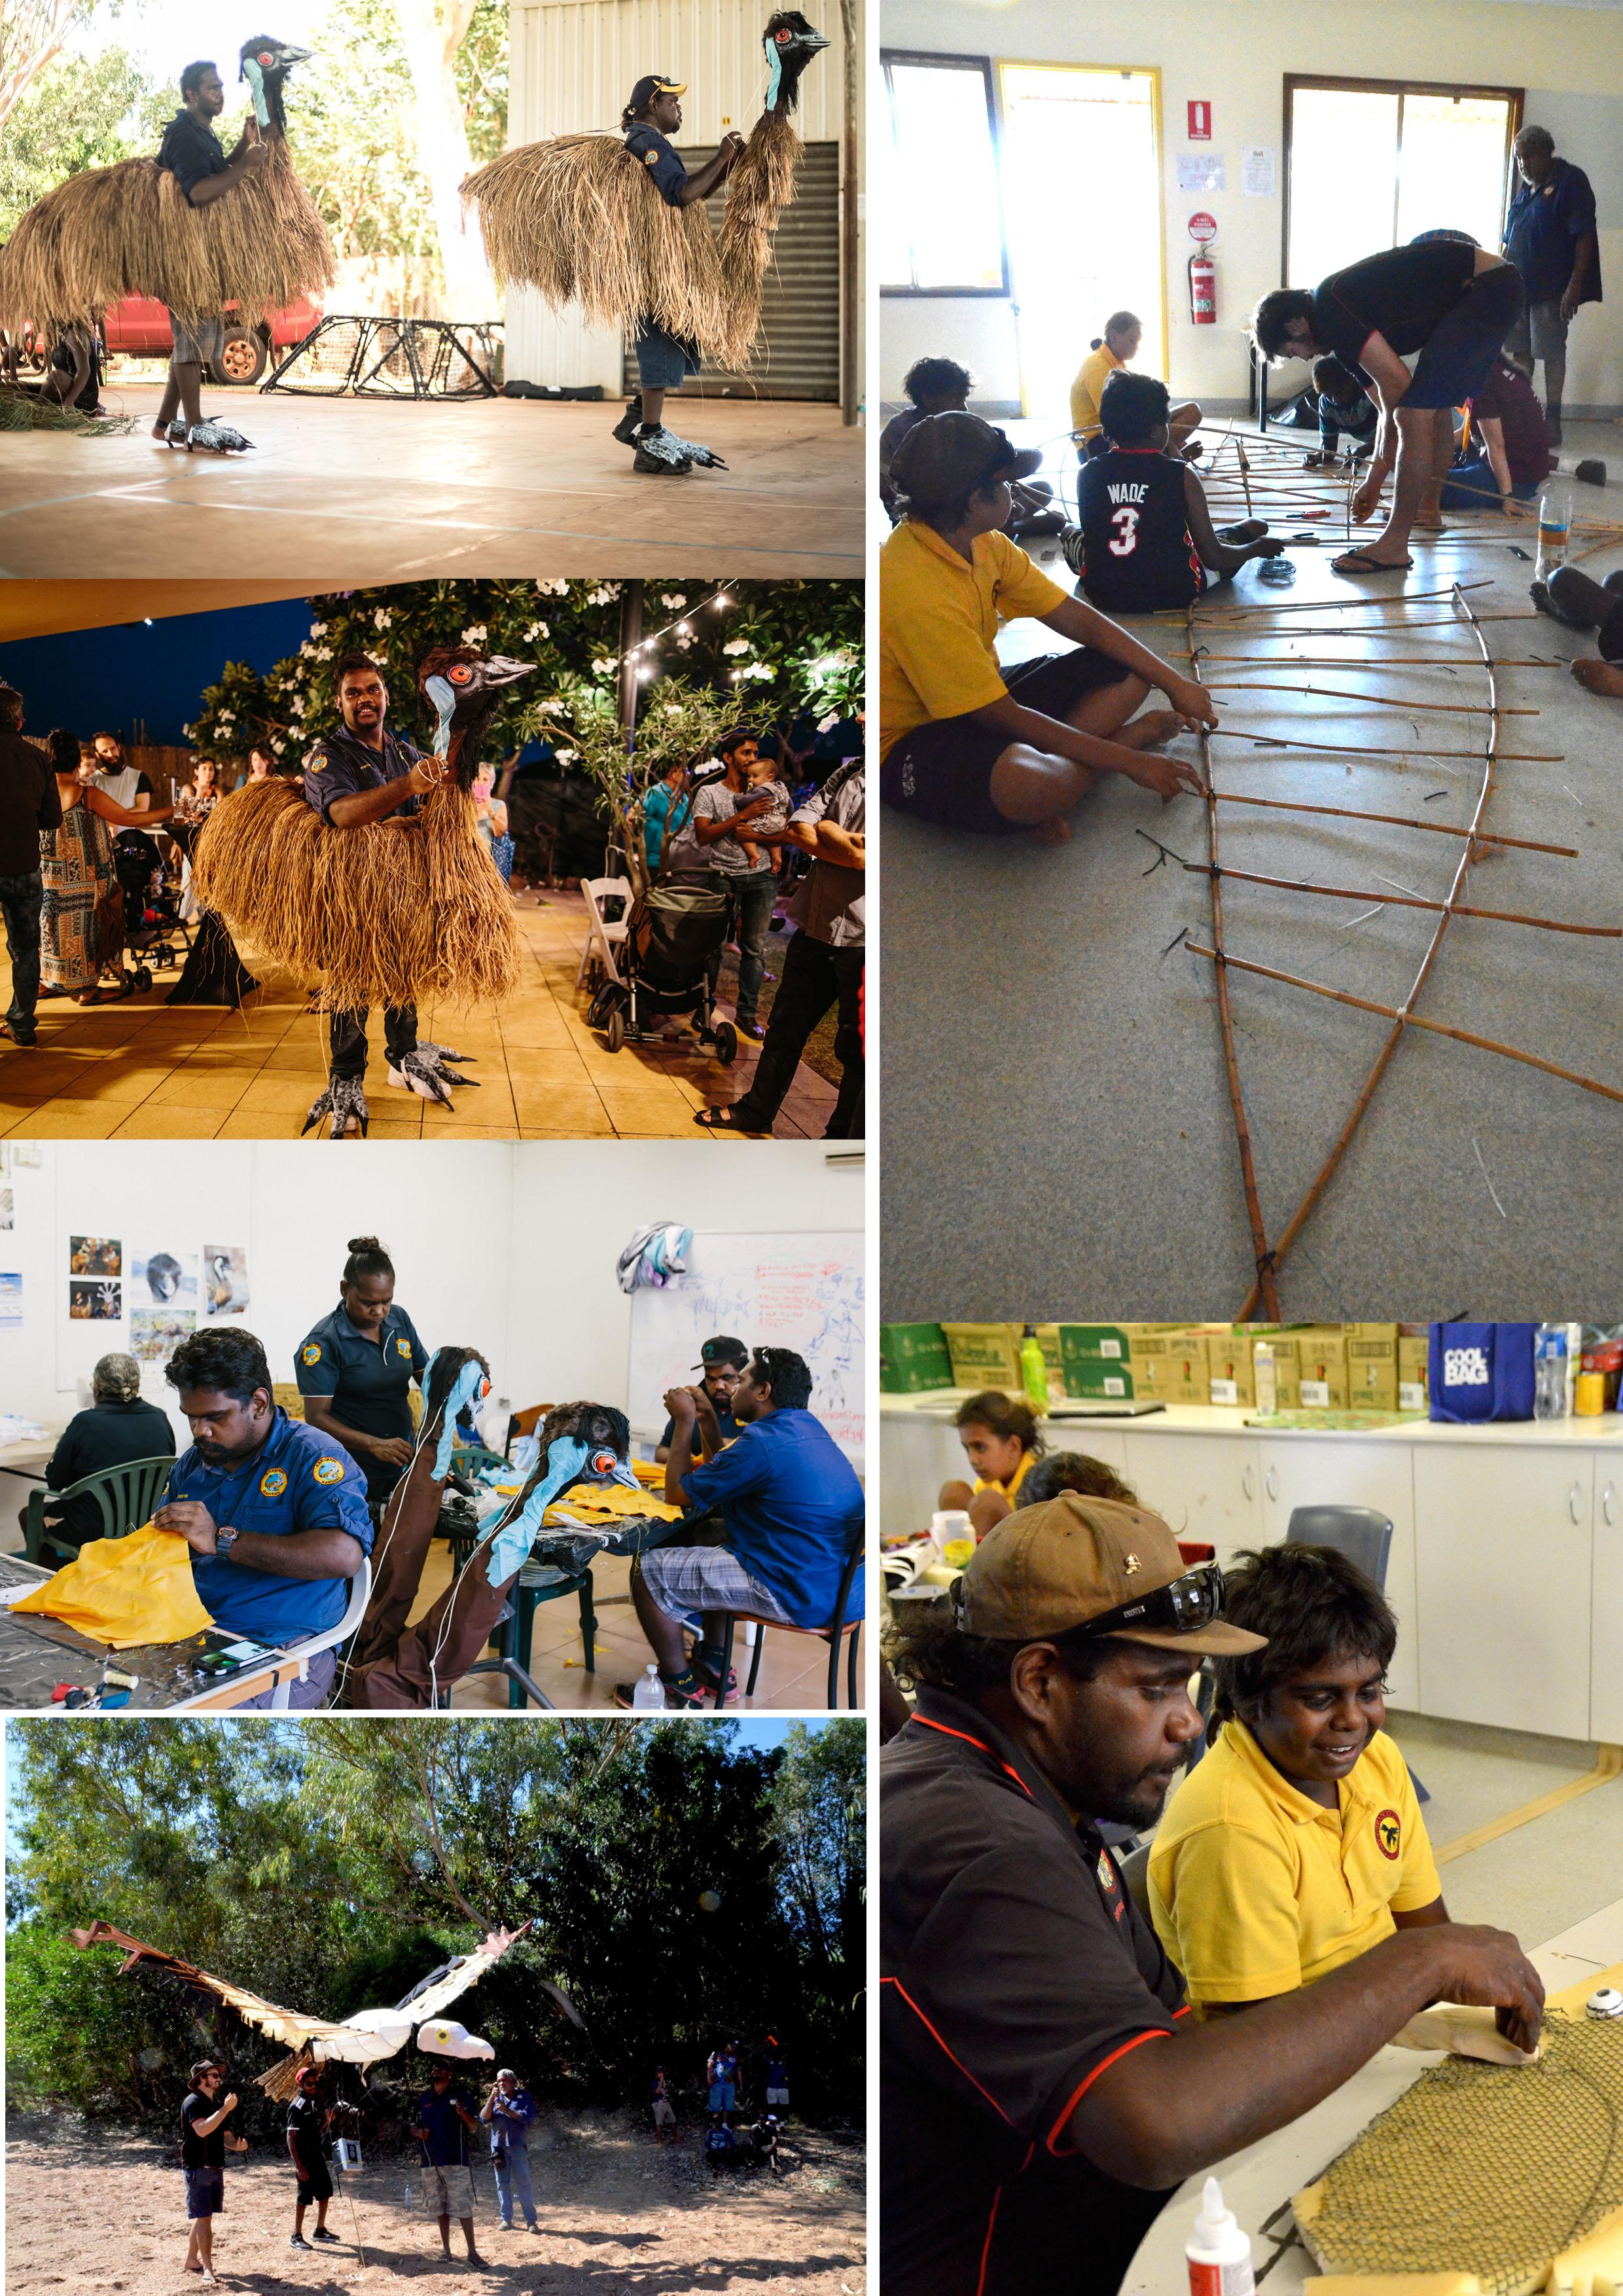 Photo ©Designer/makers/puppeteers - Karajarri (emus) and Goonyandi rangers(eagle)   Project Coordinator/facilitator/puppetry designer - Bernadette Trench-Thiedeman